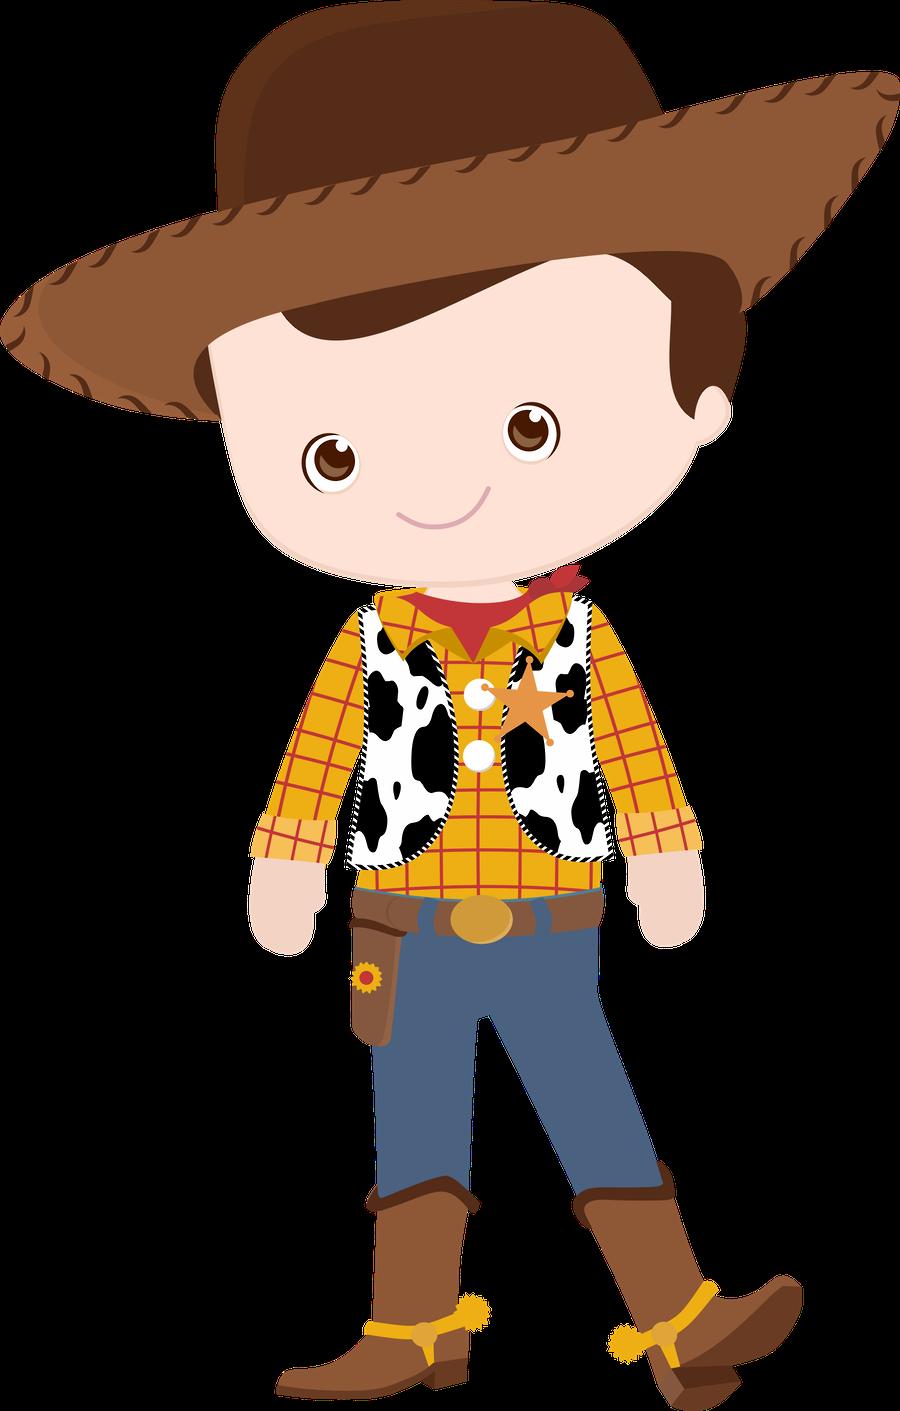 Woody car clipart jpg free Toy Story - Minus   baby   Pinterest   Toy, Clip art and Fiestas jpg free